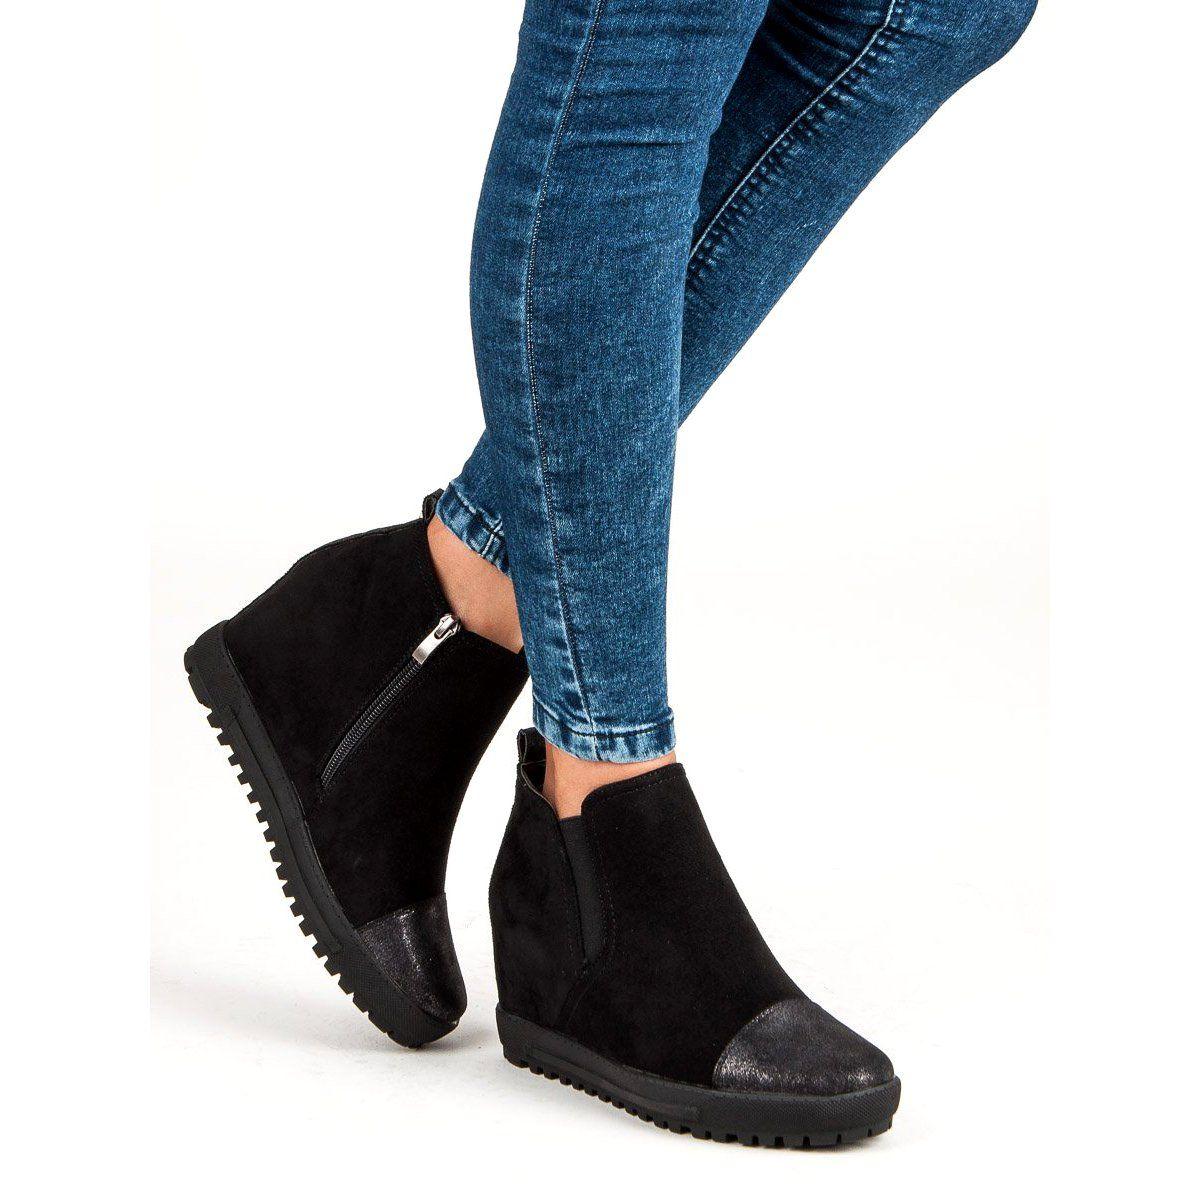 Filippo Zamszowe Botki Na Koturnie Czarne Ankle Boot Shoes Chelsea Boots